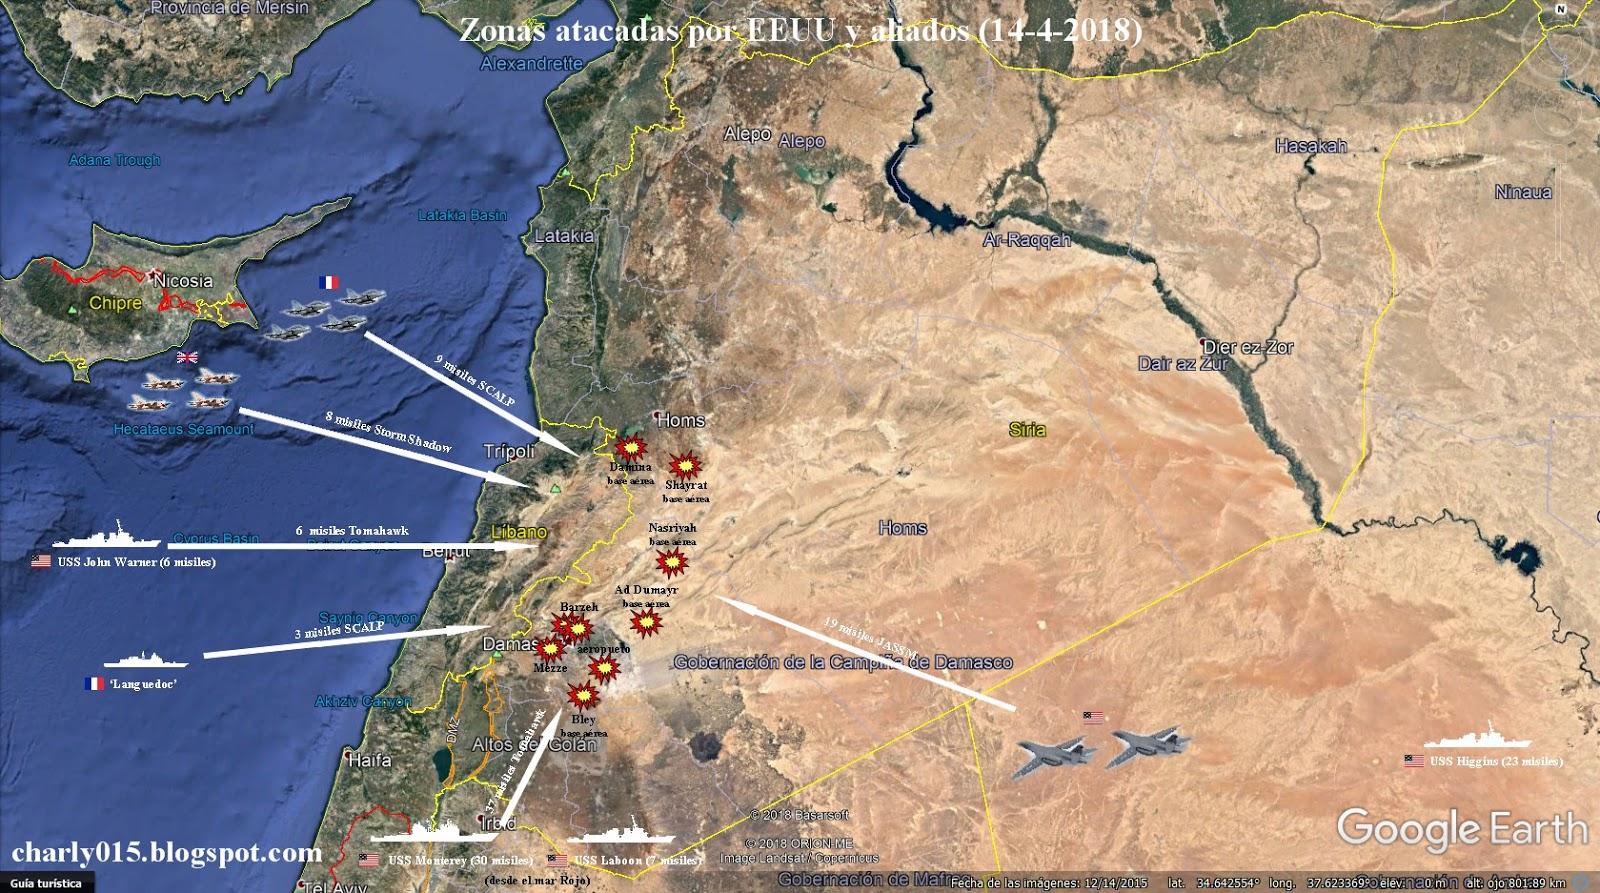 siria%2Bataque%2BEEUU%2Bbrit%25C3%25A1nico%2Bfranc%25C3%25A9s%2B2018-4-14%2Bzonas.jpg